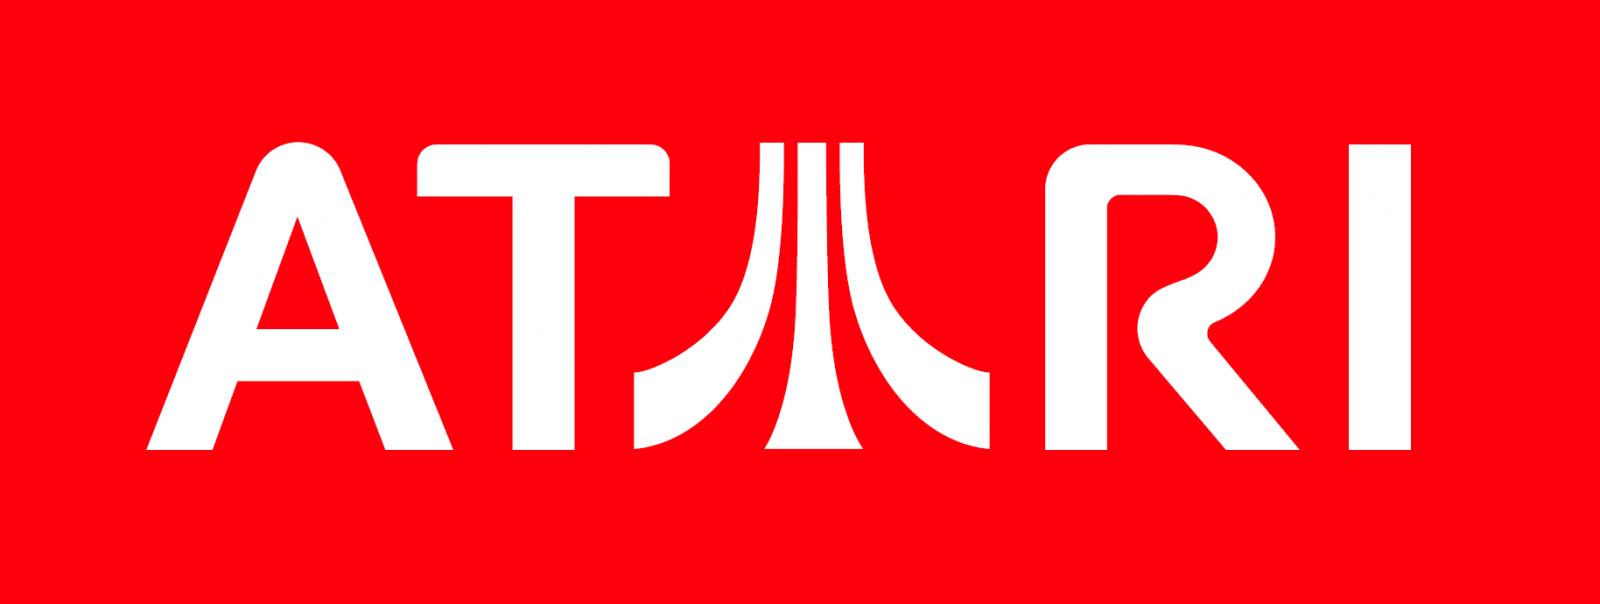 An image showing the Atari Logo